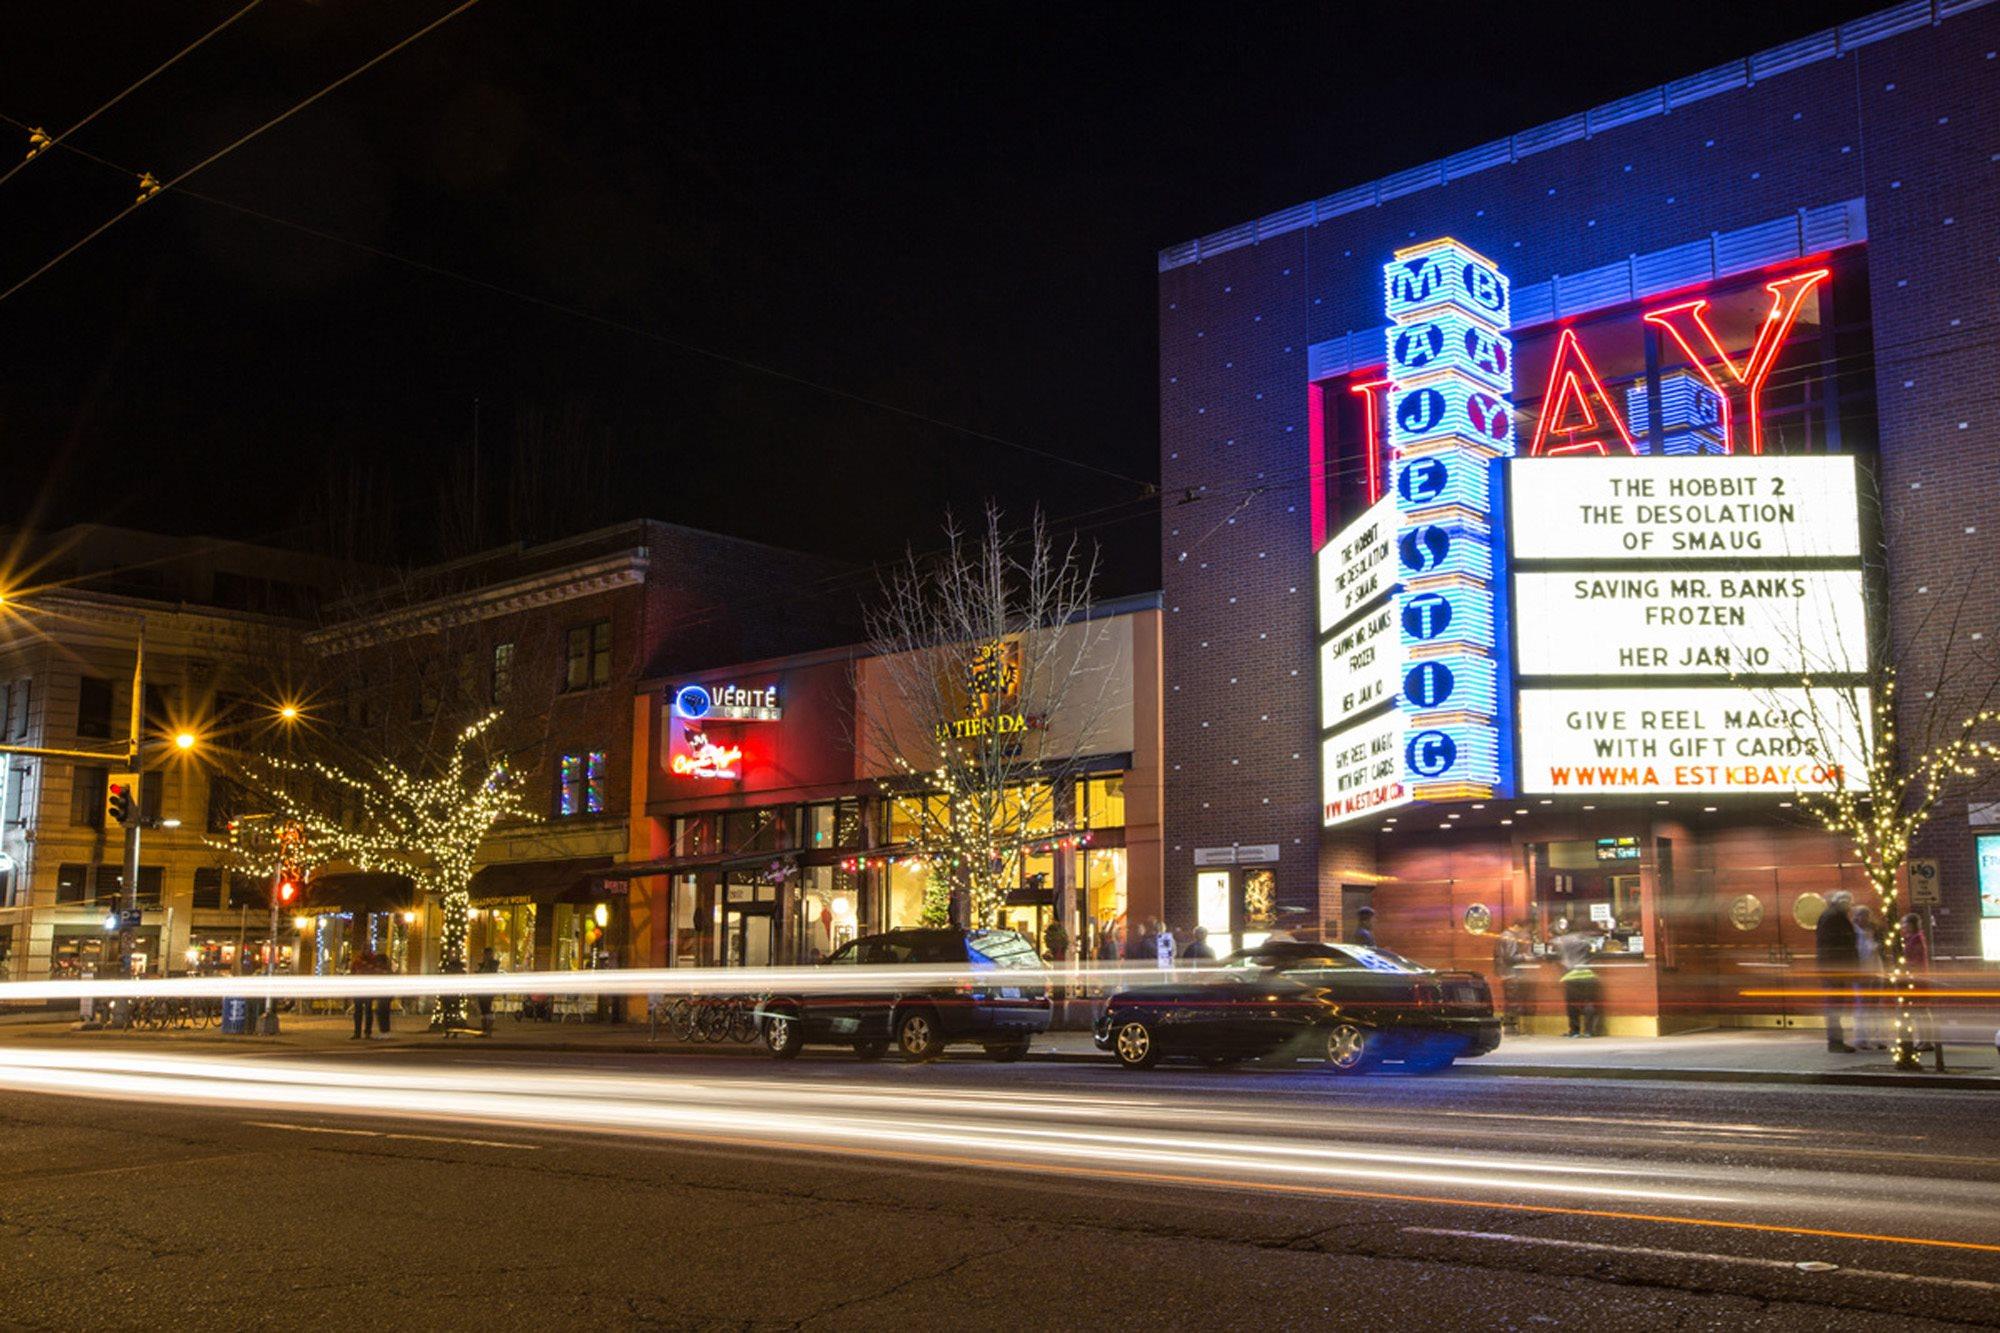 Seattle photogallery 67